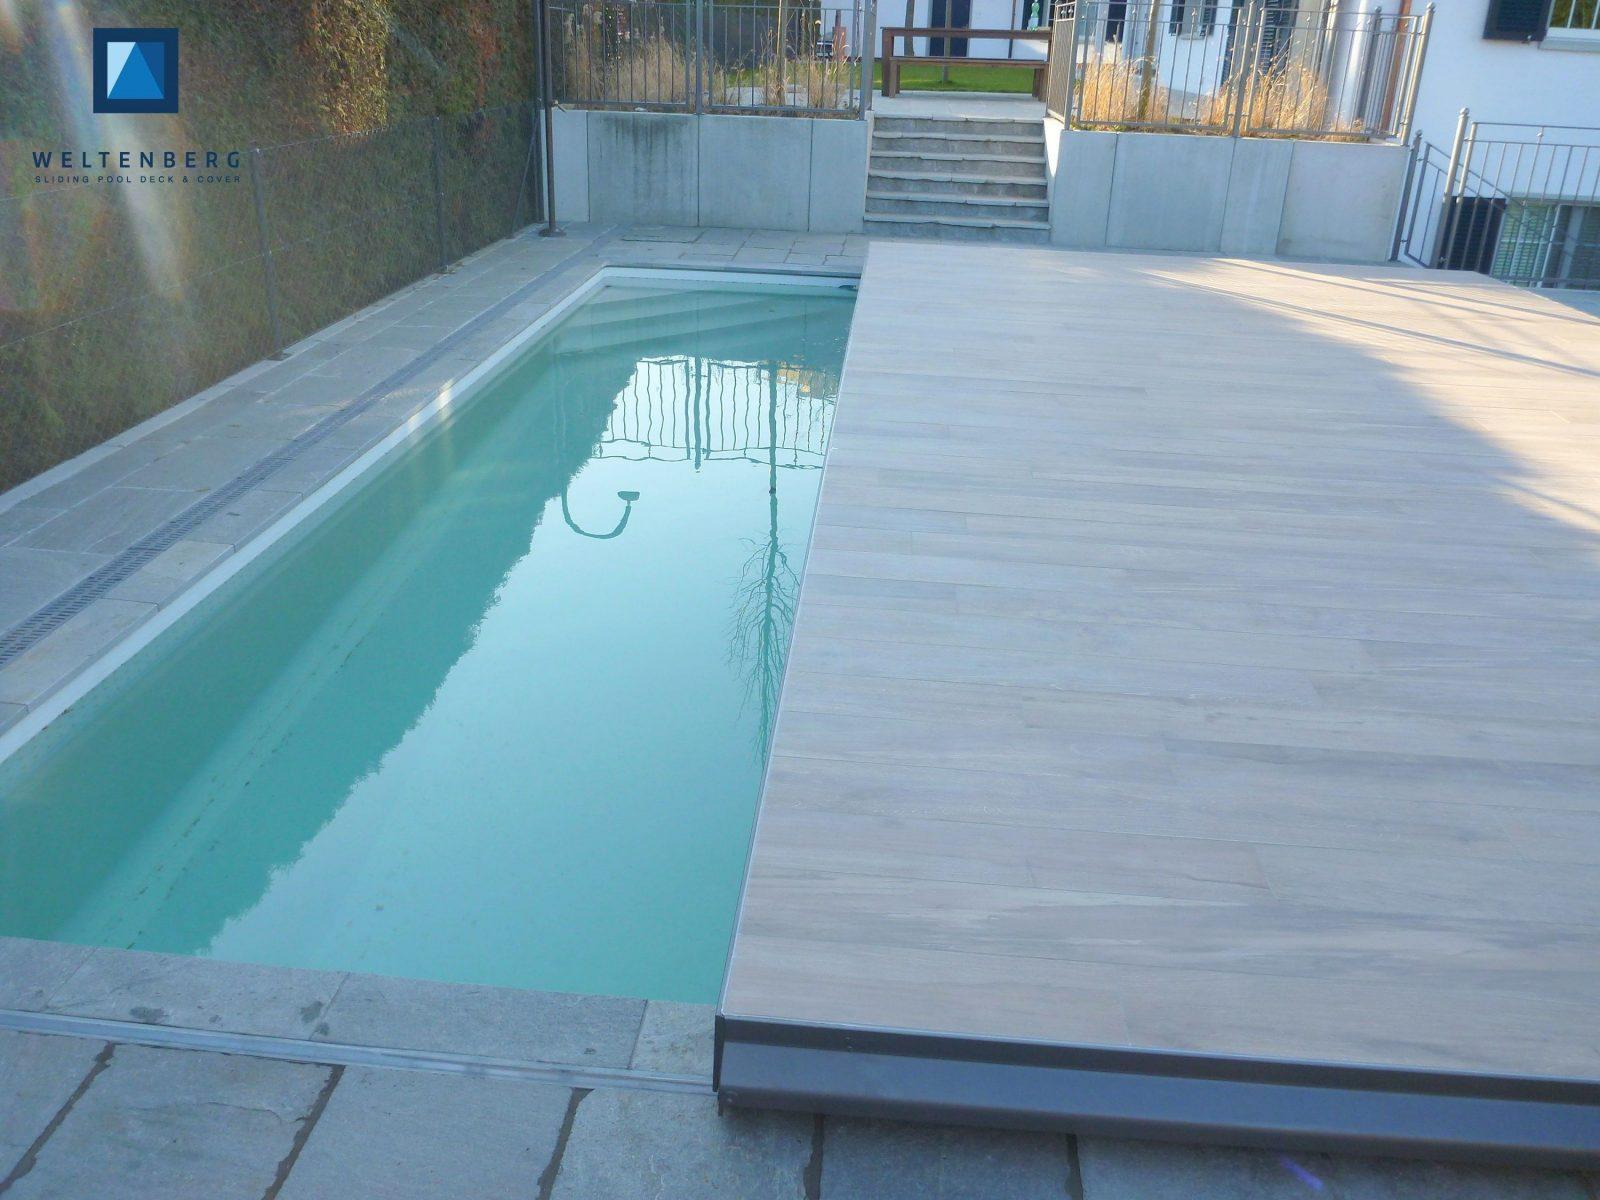 Pool Rollo Selber Bauen Trendy Bodenfolie Verlegen With Pool Rollo von Pool Rollo Selber Bauen Photo